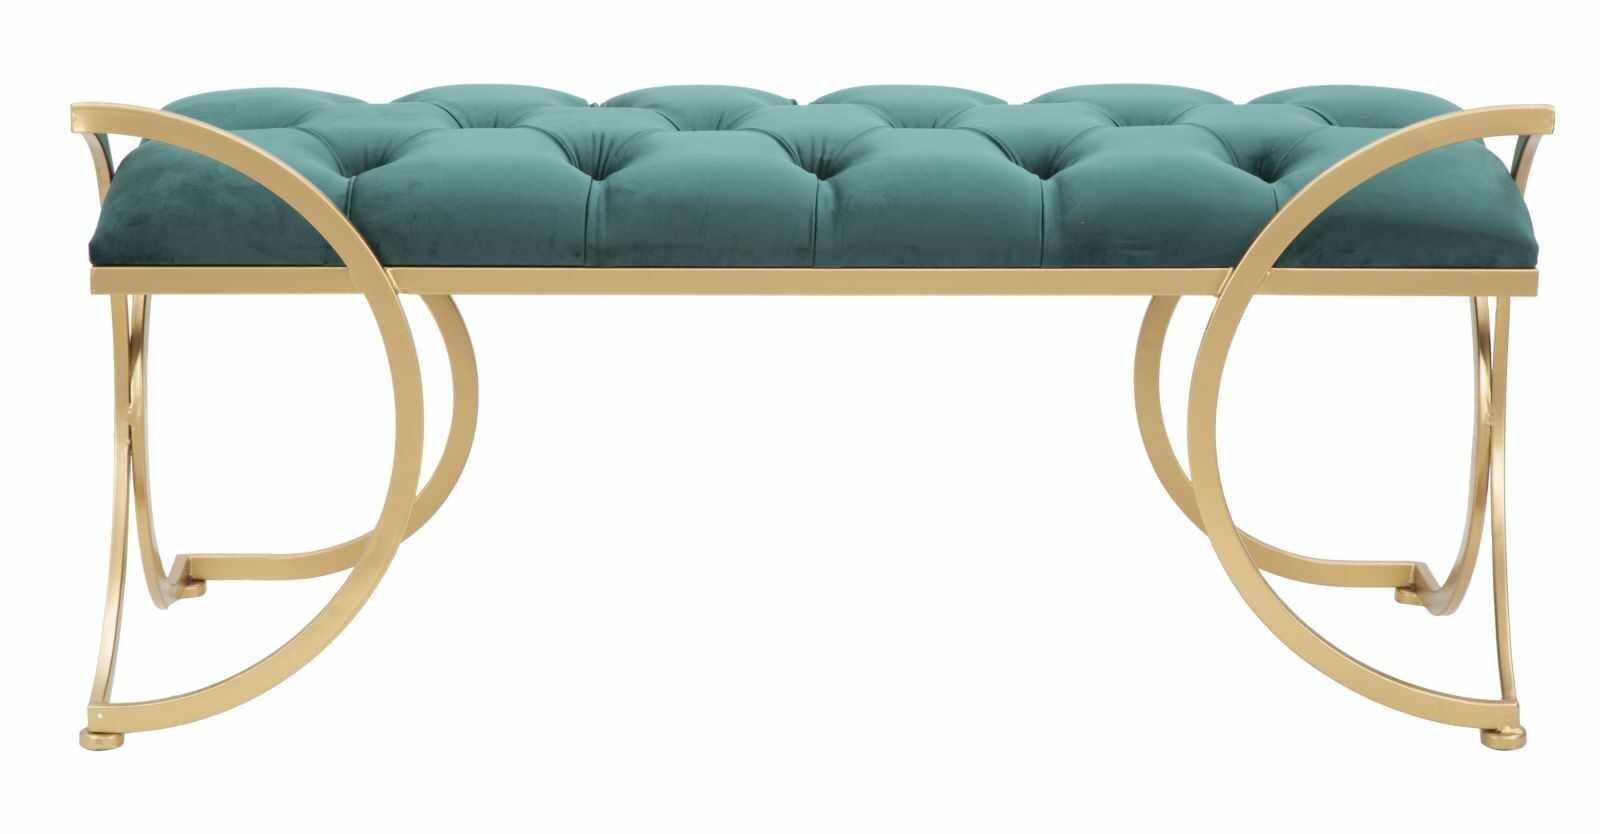 Banca tapitata cu stofa si picioare metalice Luxy Velvet Verde / Auriu, l103xA43xH47 cm la pret 922 lei